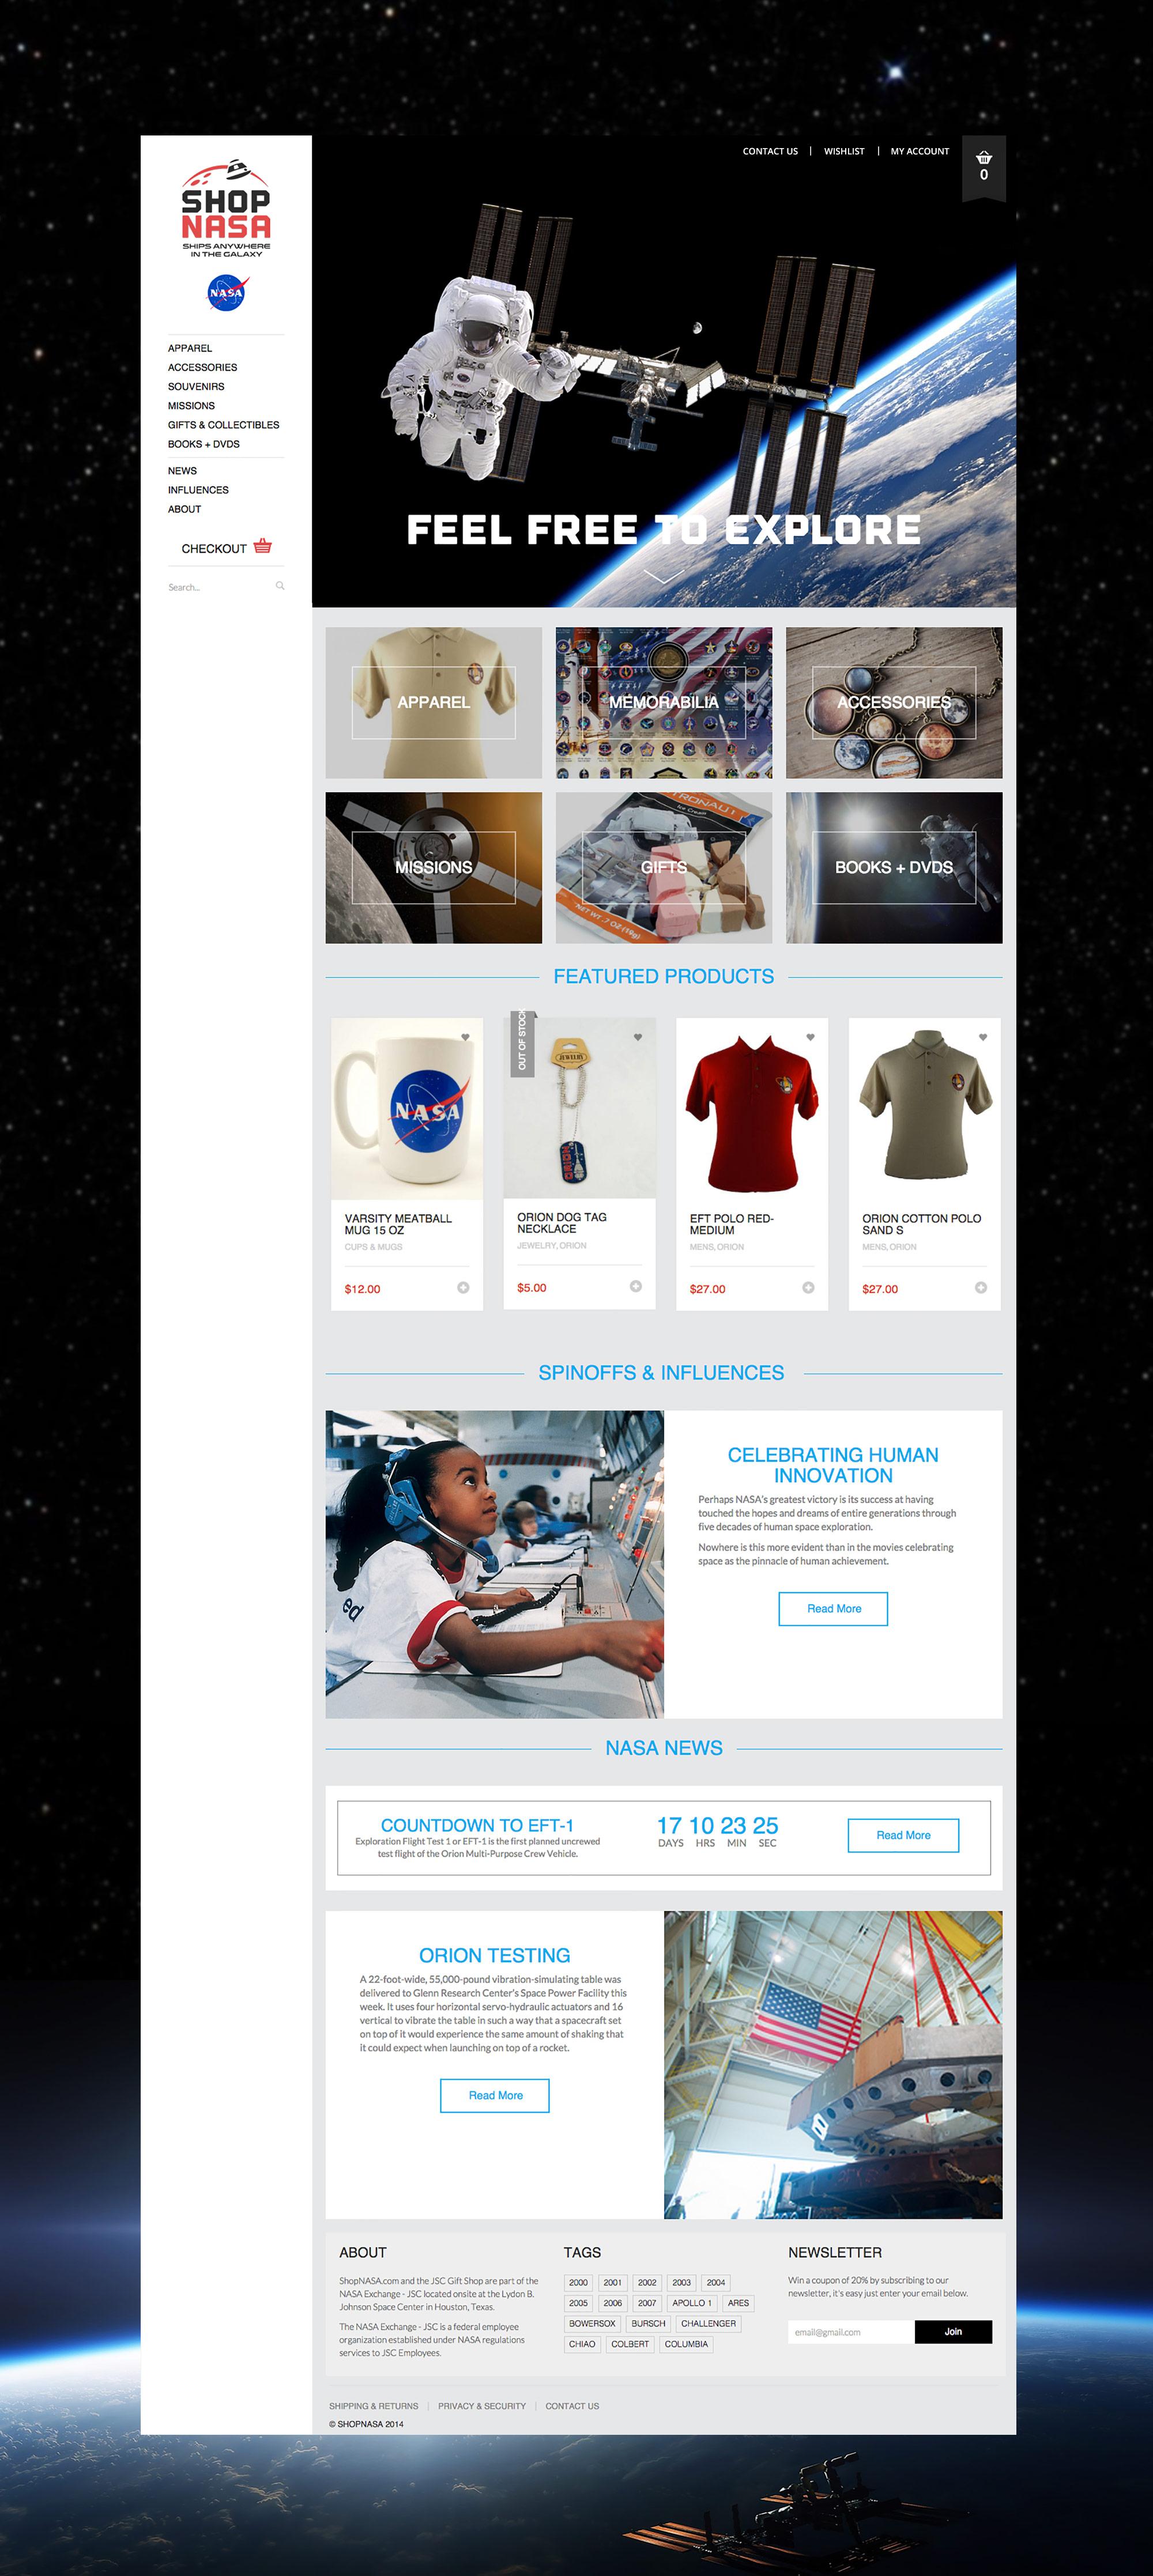 ShopNasa-homepage.jpg